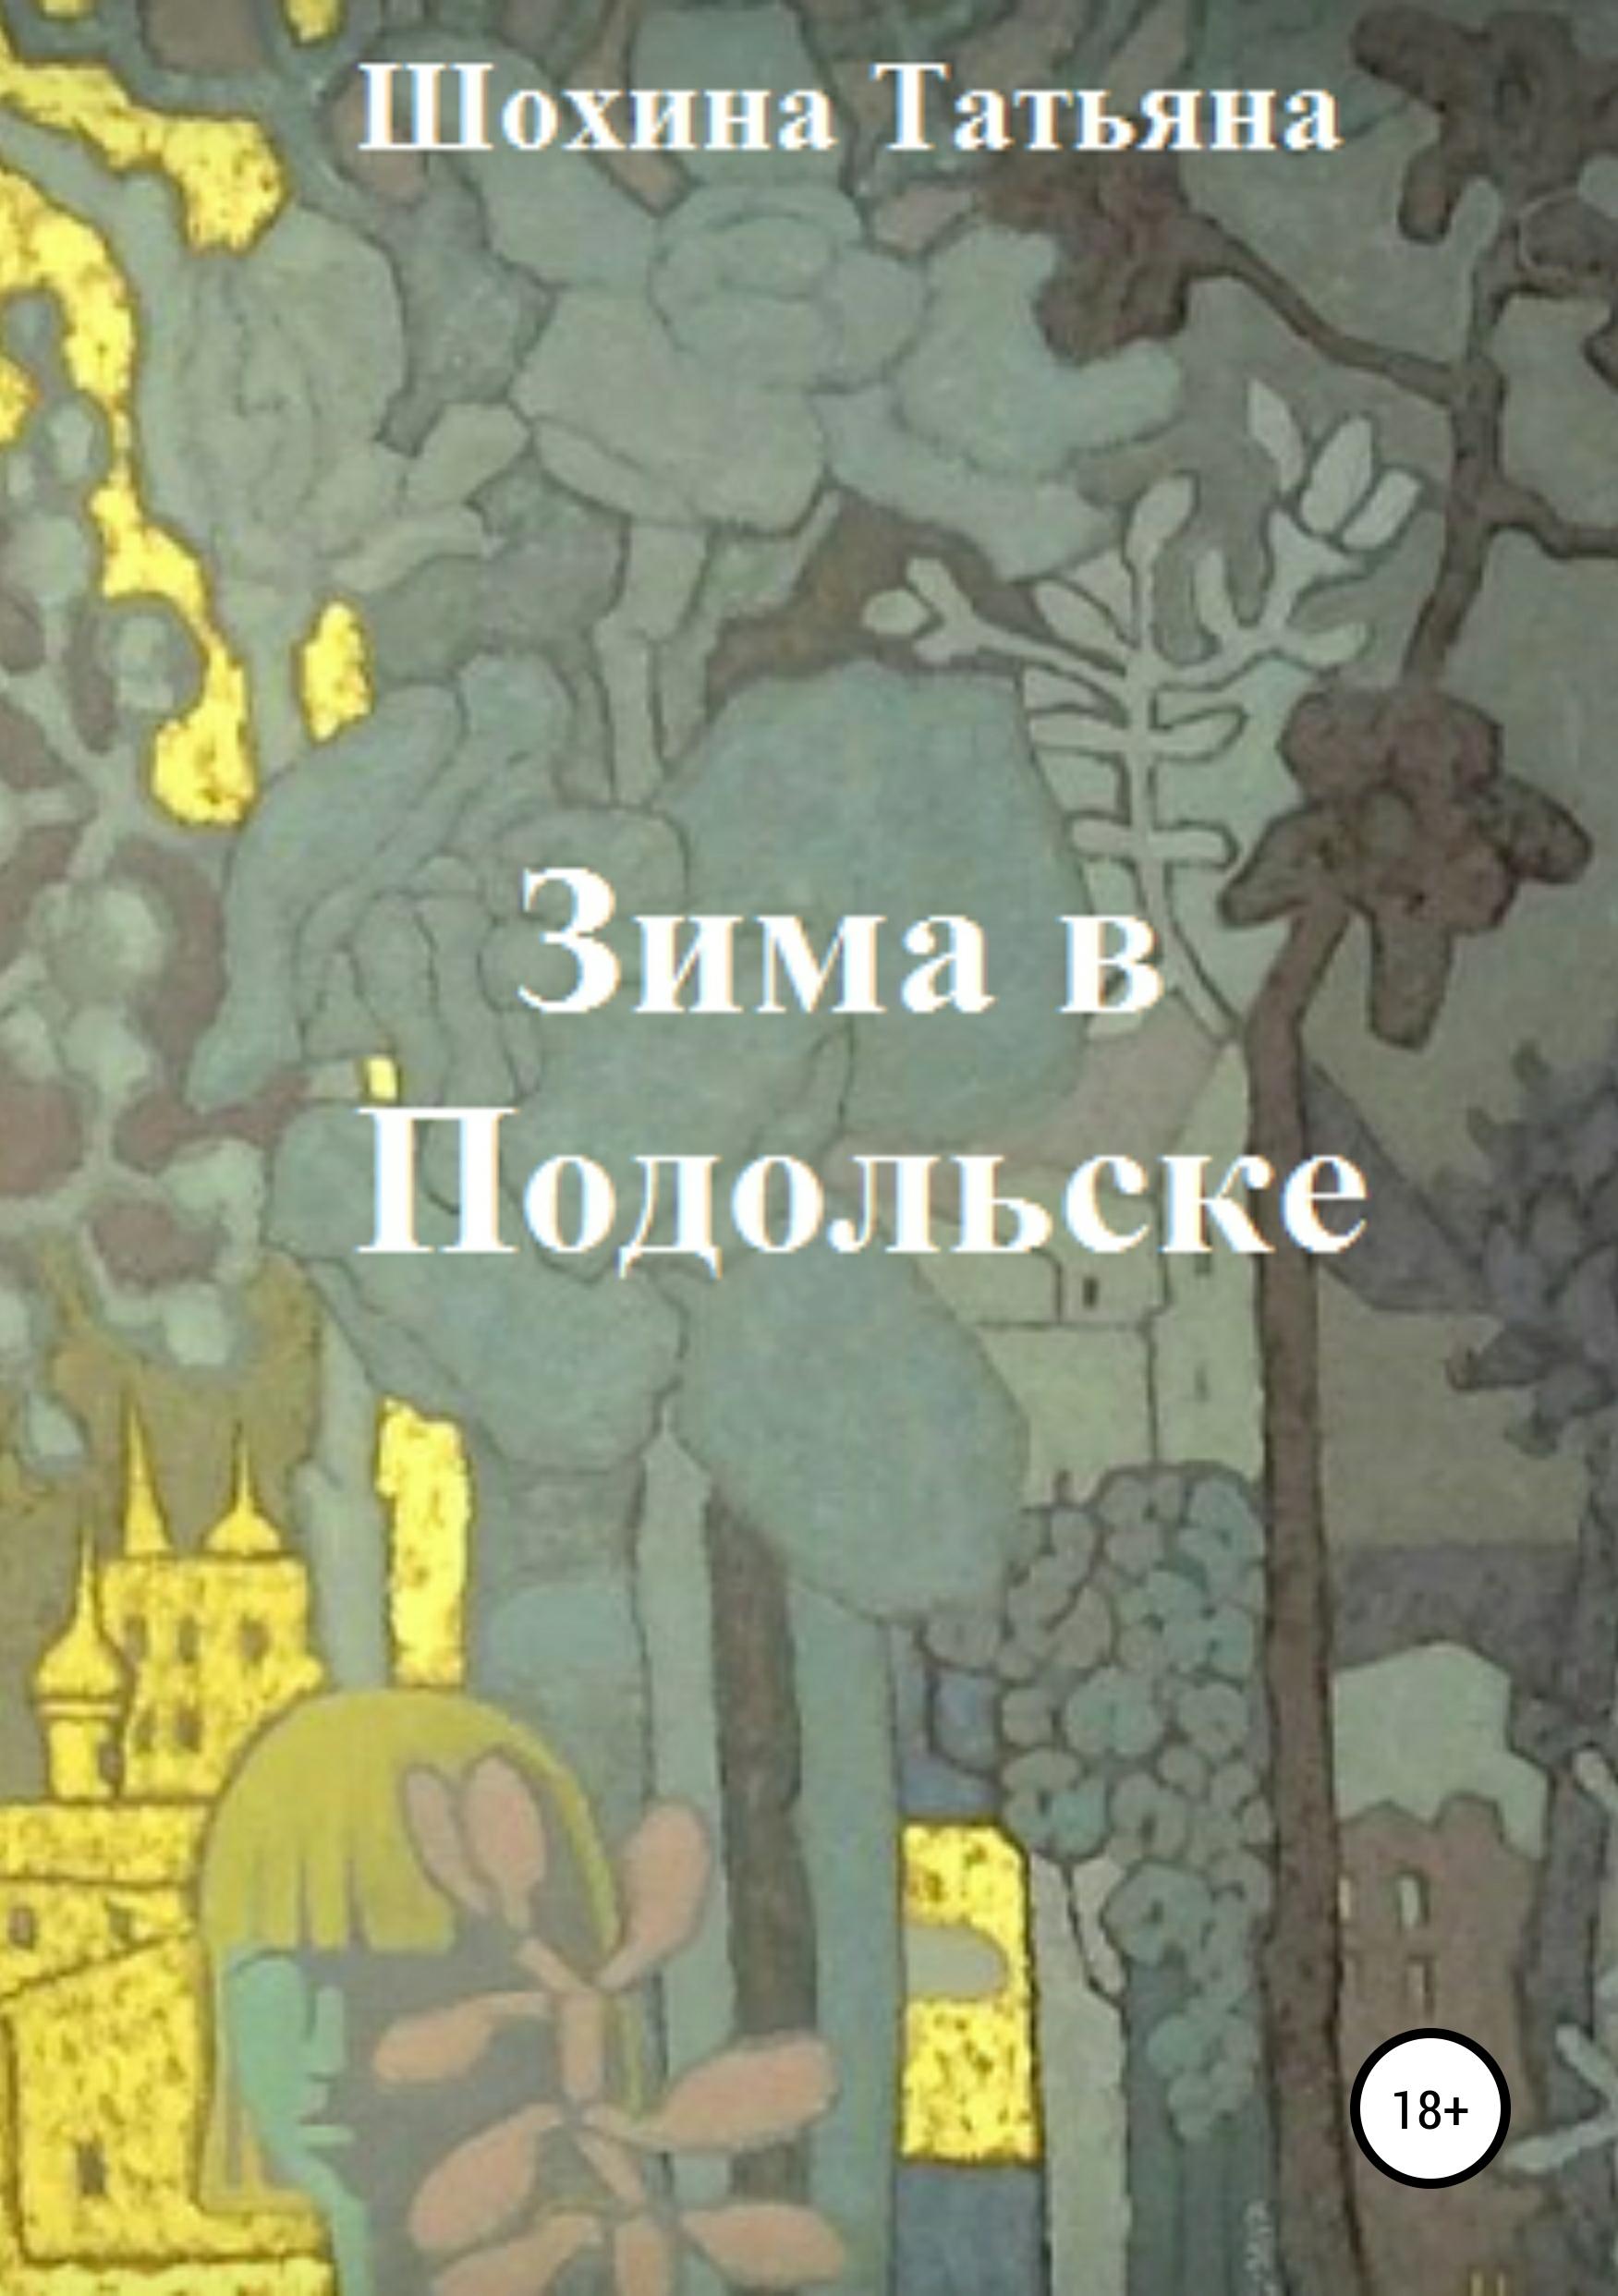 Татьяна Шохина Зима